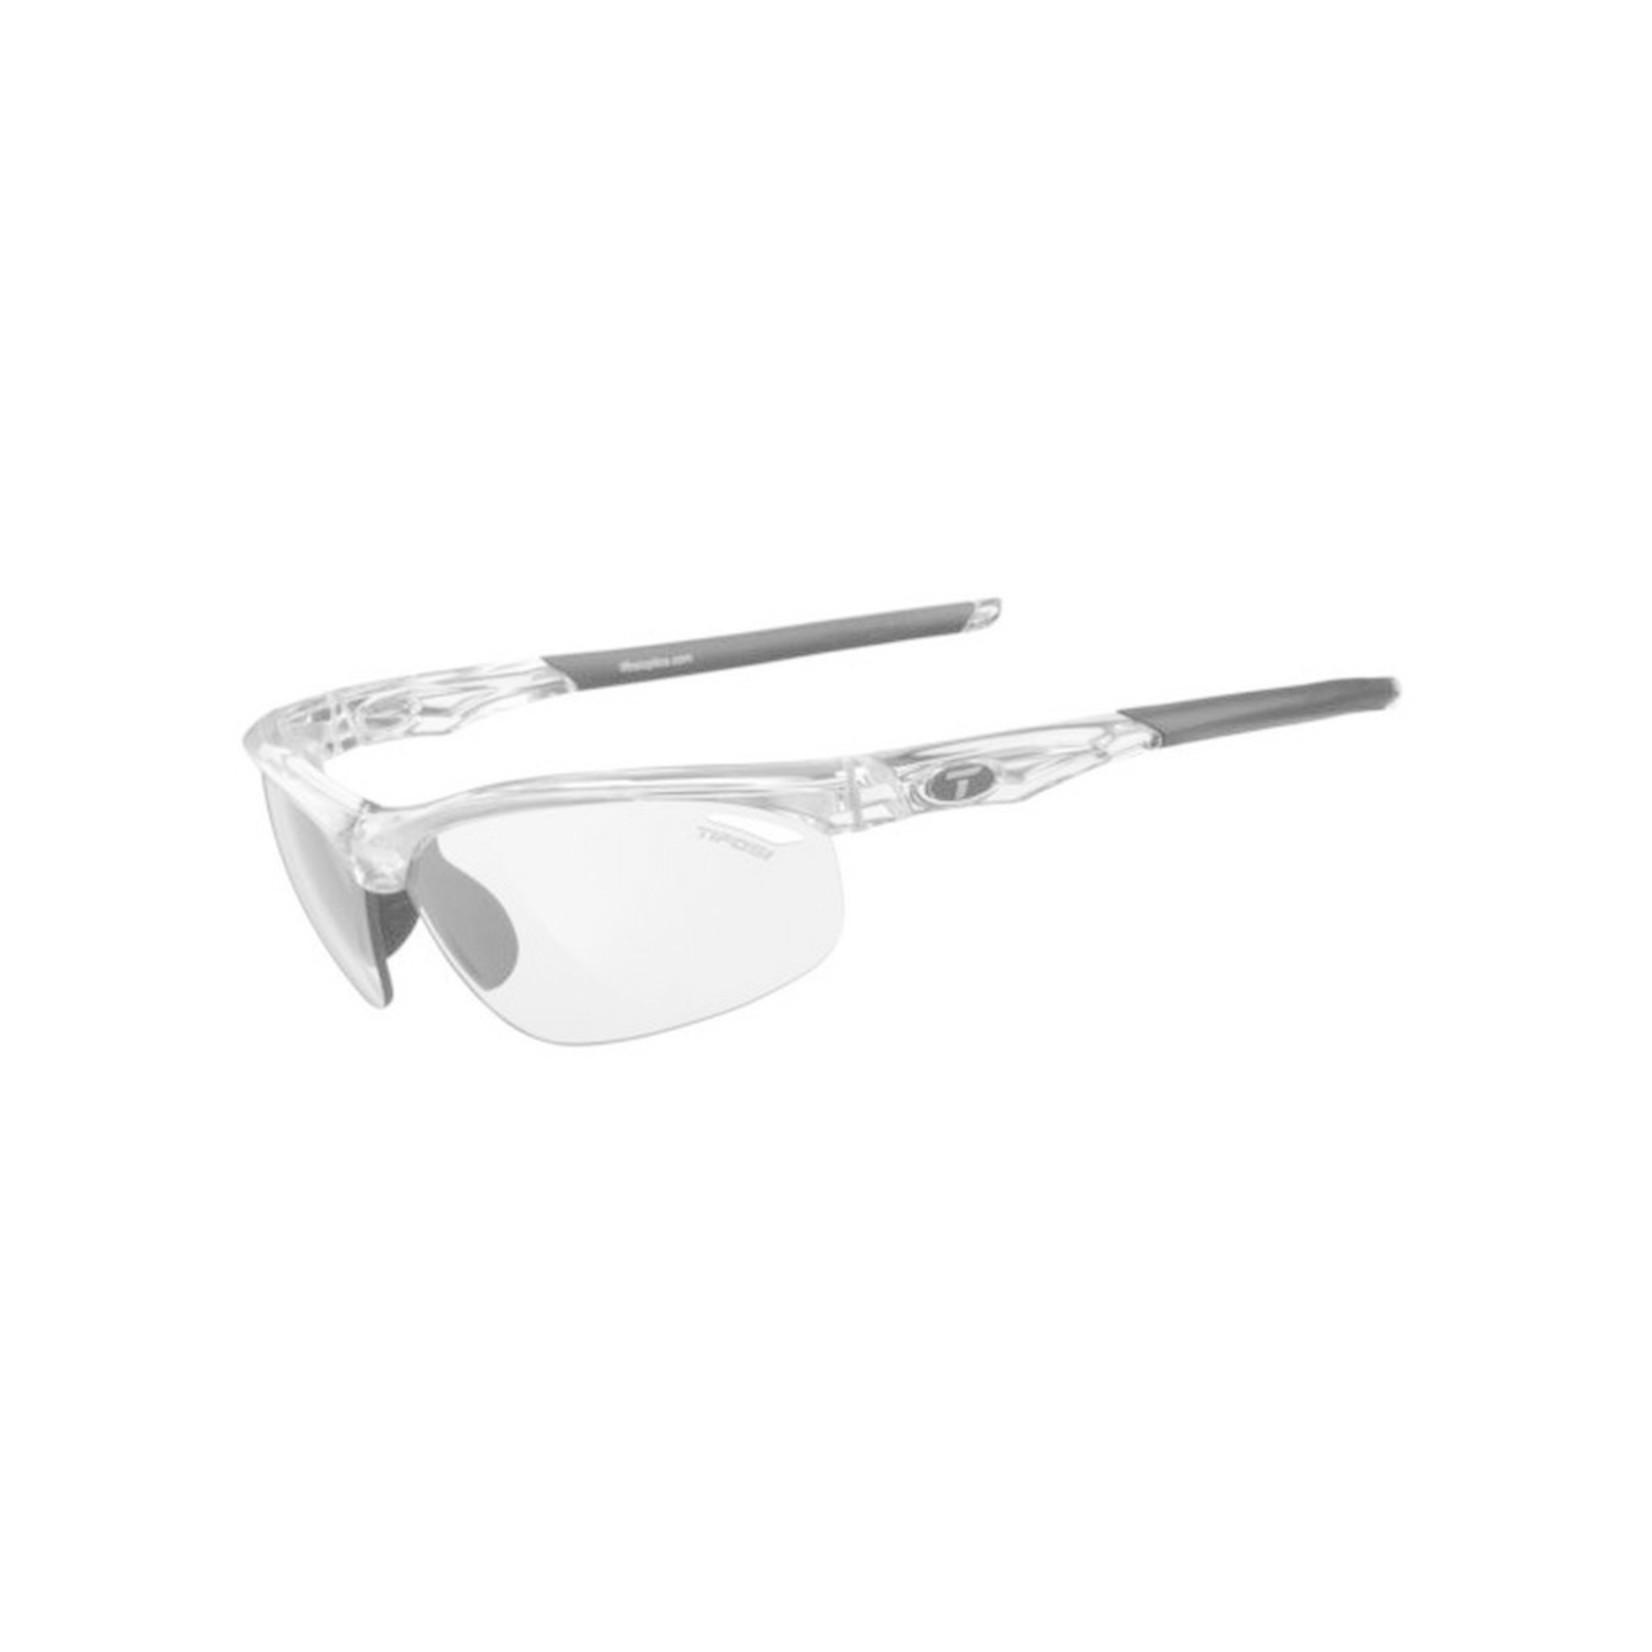 TIFOSI OPTICS Sunglasses Tifosi Veloce Crystal Clear